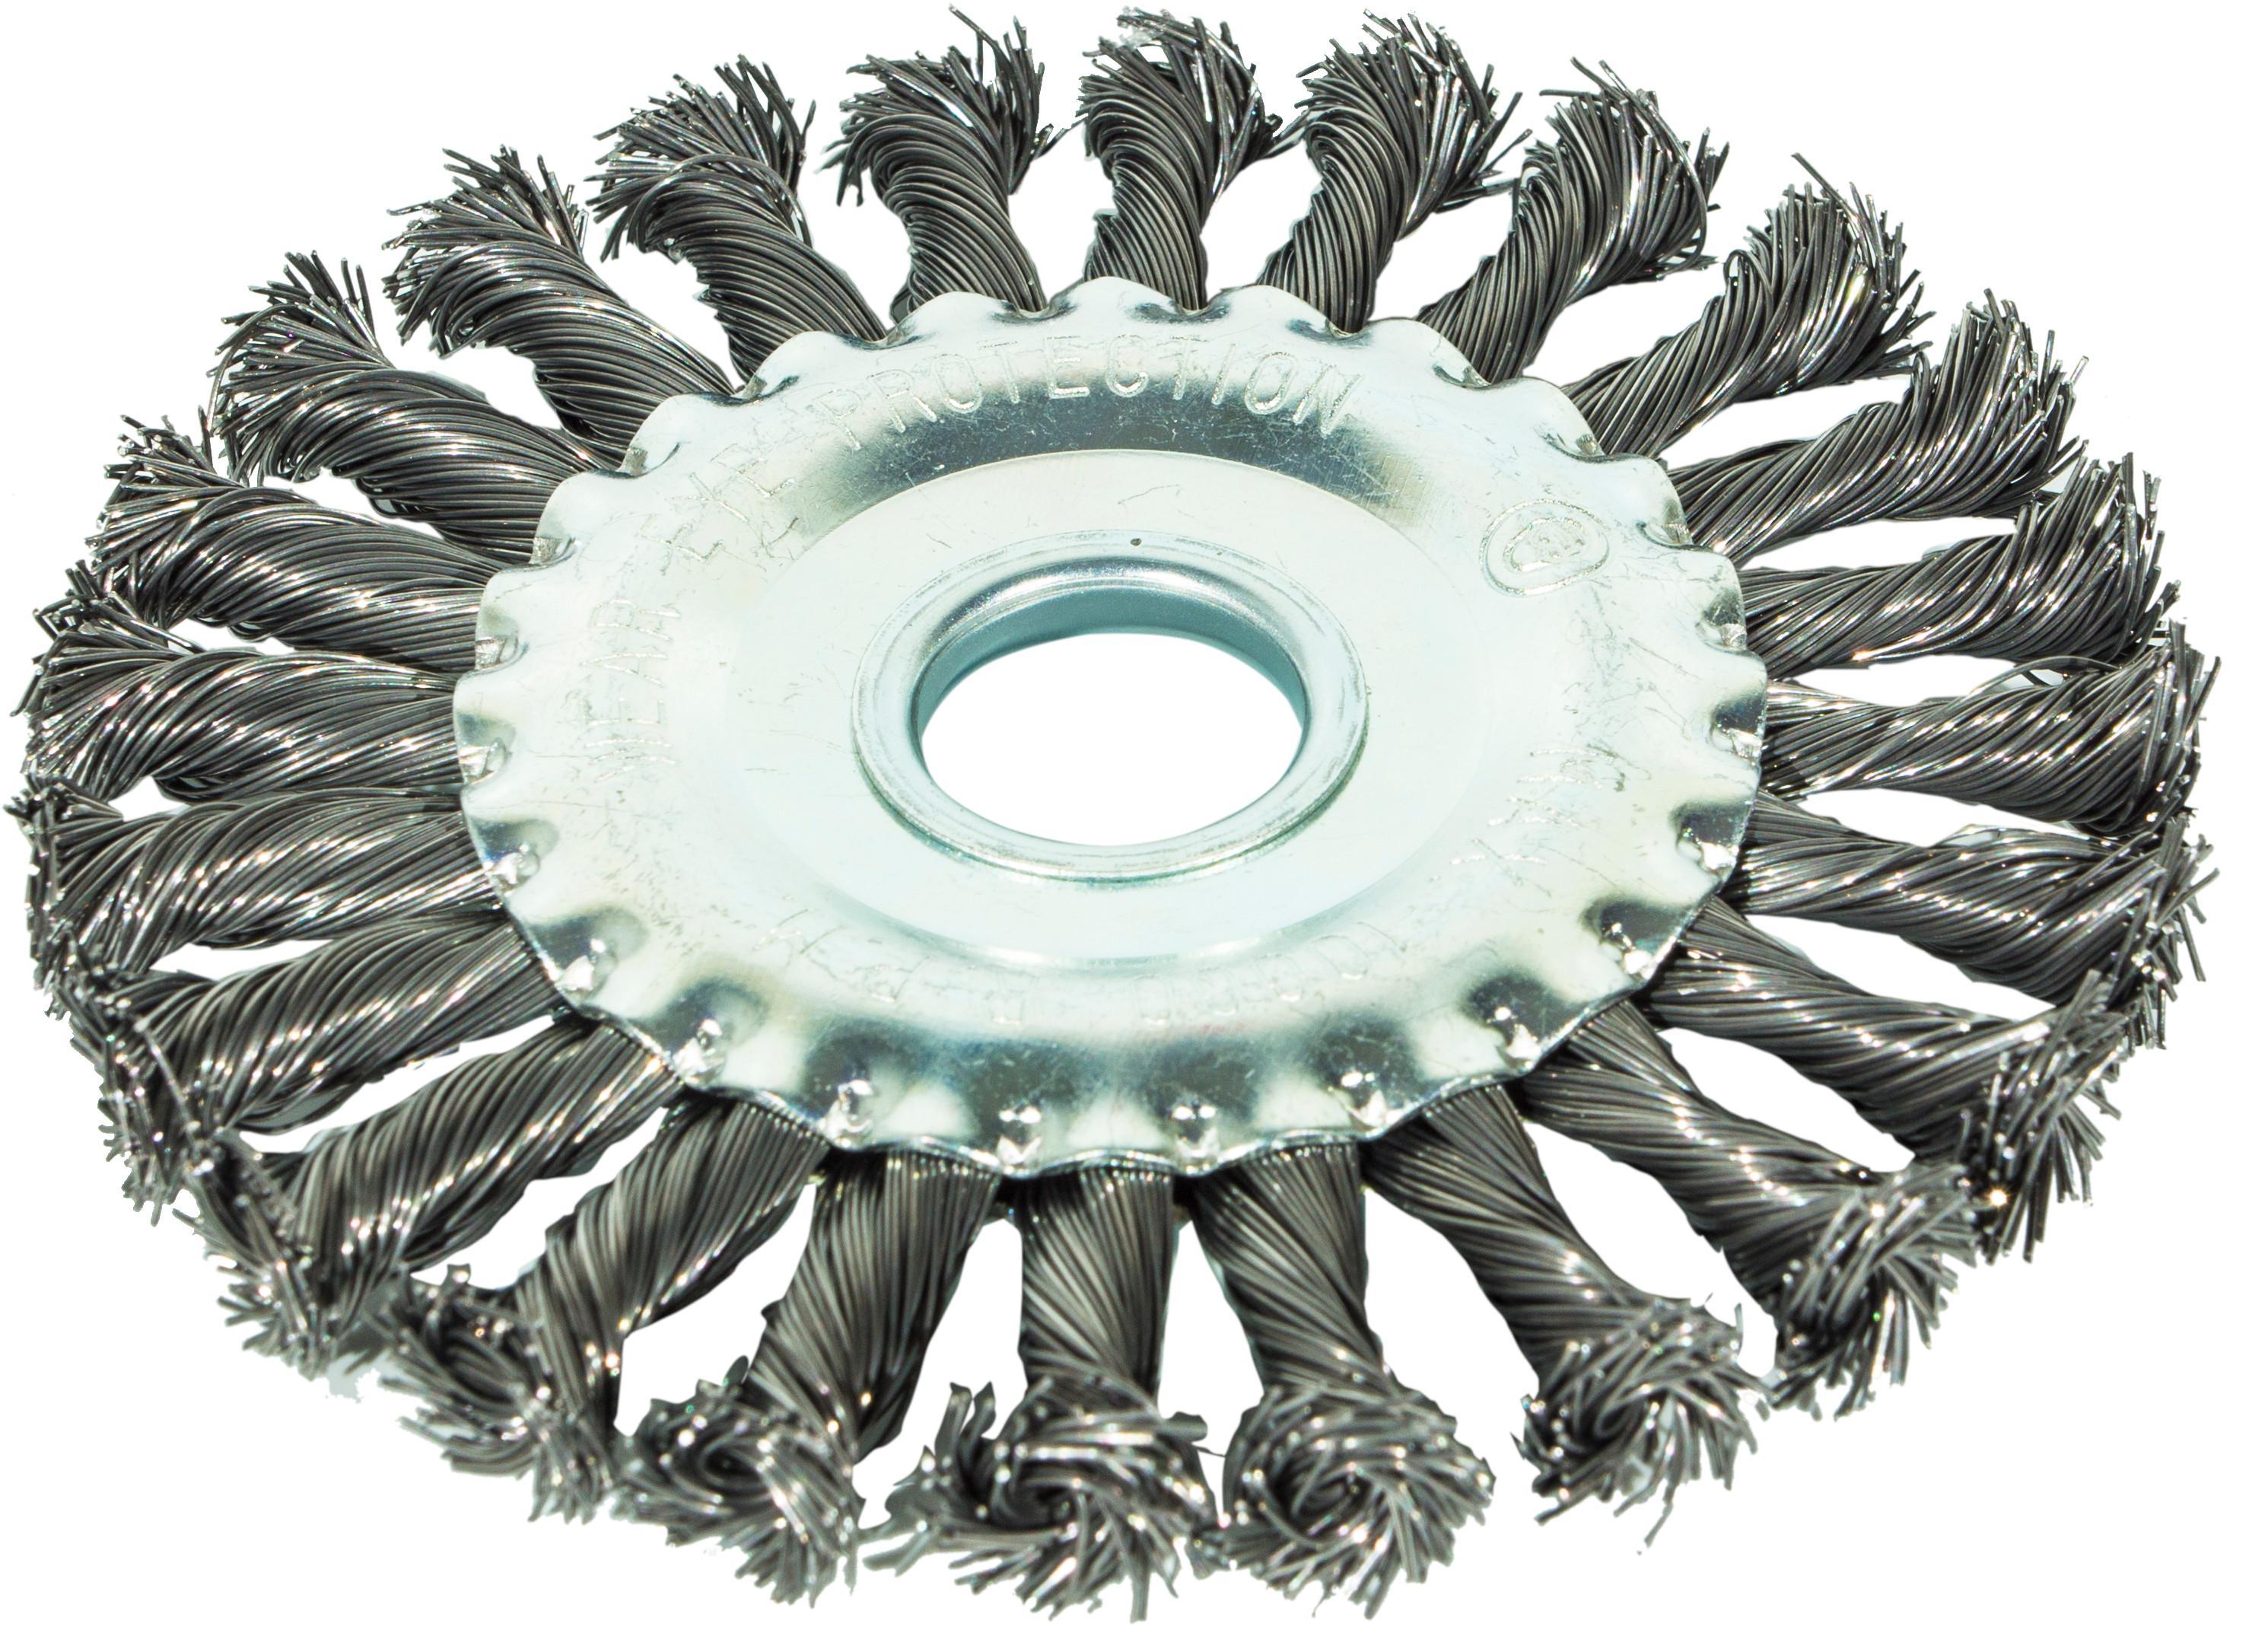 Кордщетка Grossmeister плоская 150мм для УШМ витая сталь (21028003)